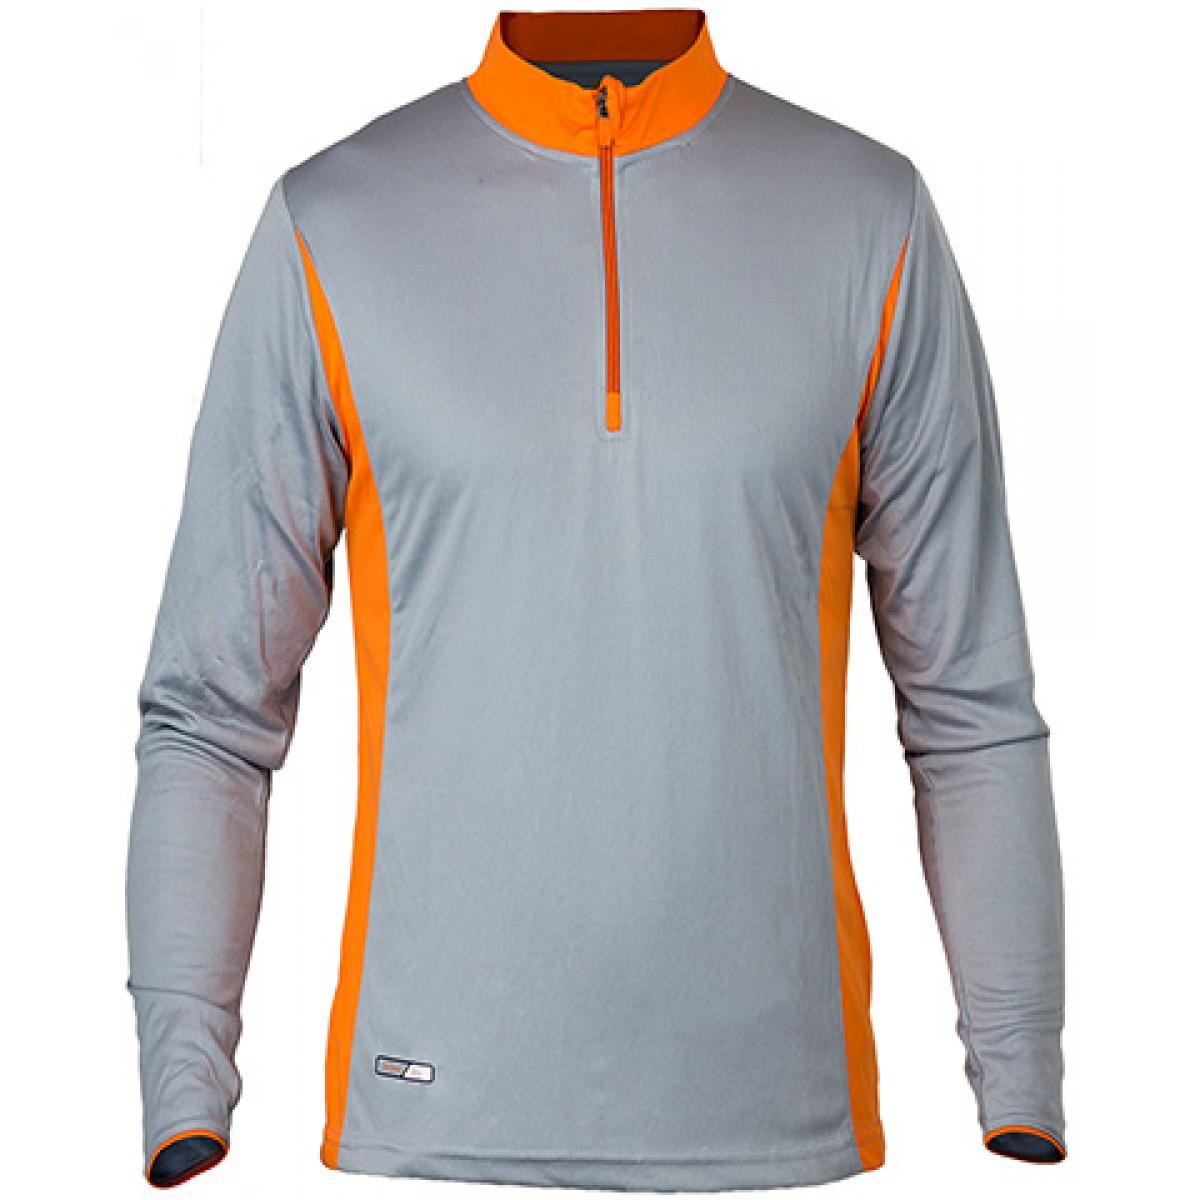 Long Sleeves 3/4 Zip Performance With Side Insert-Neon Orange -XL